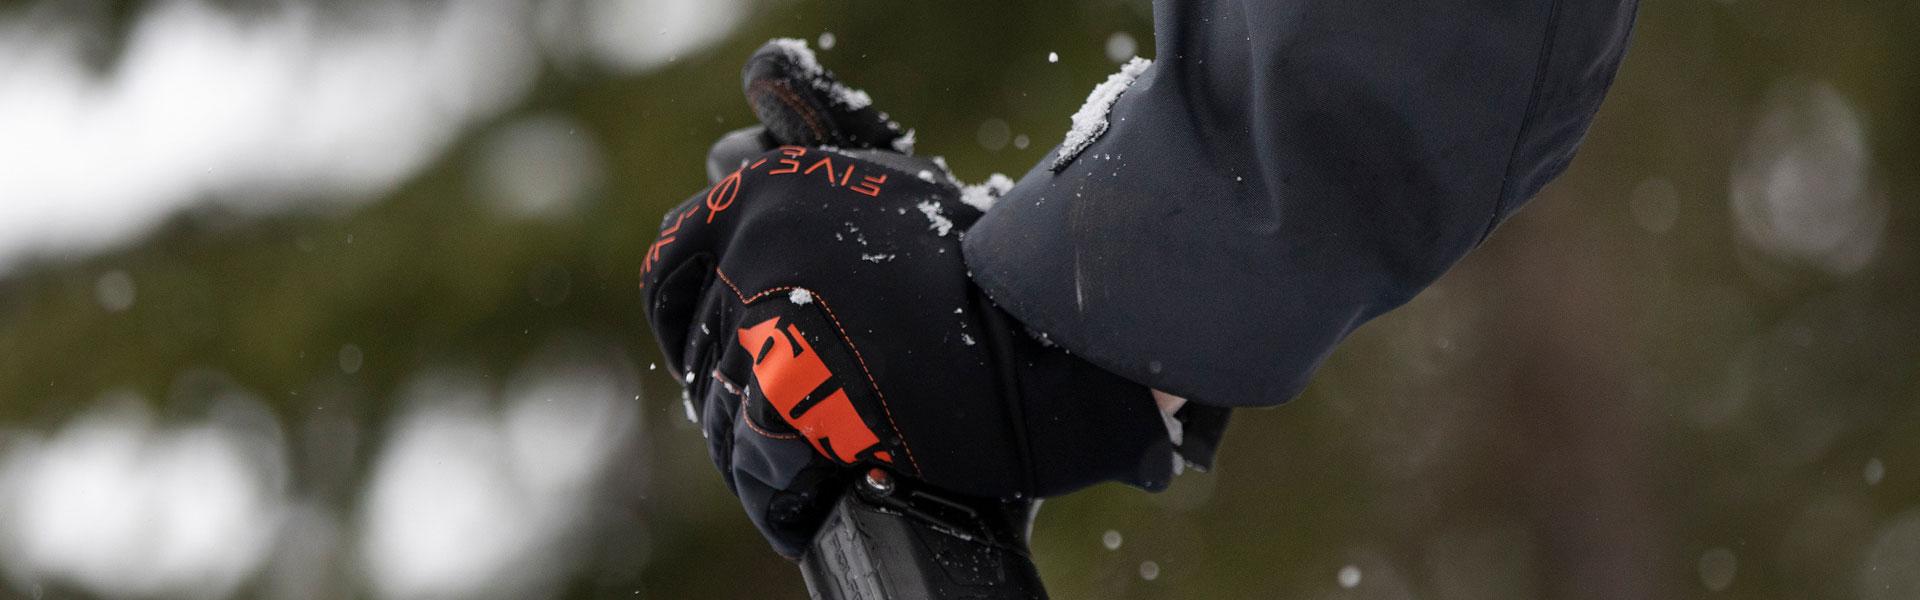 509 Freeride Gloves